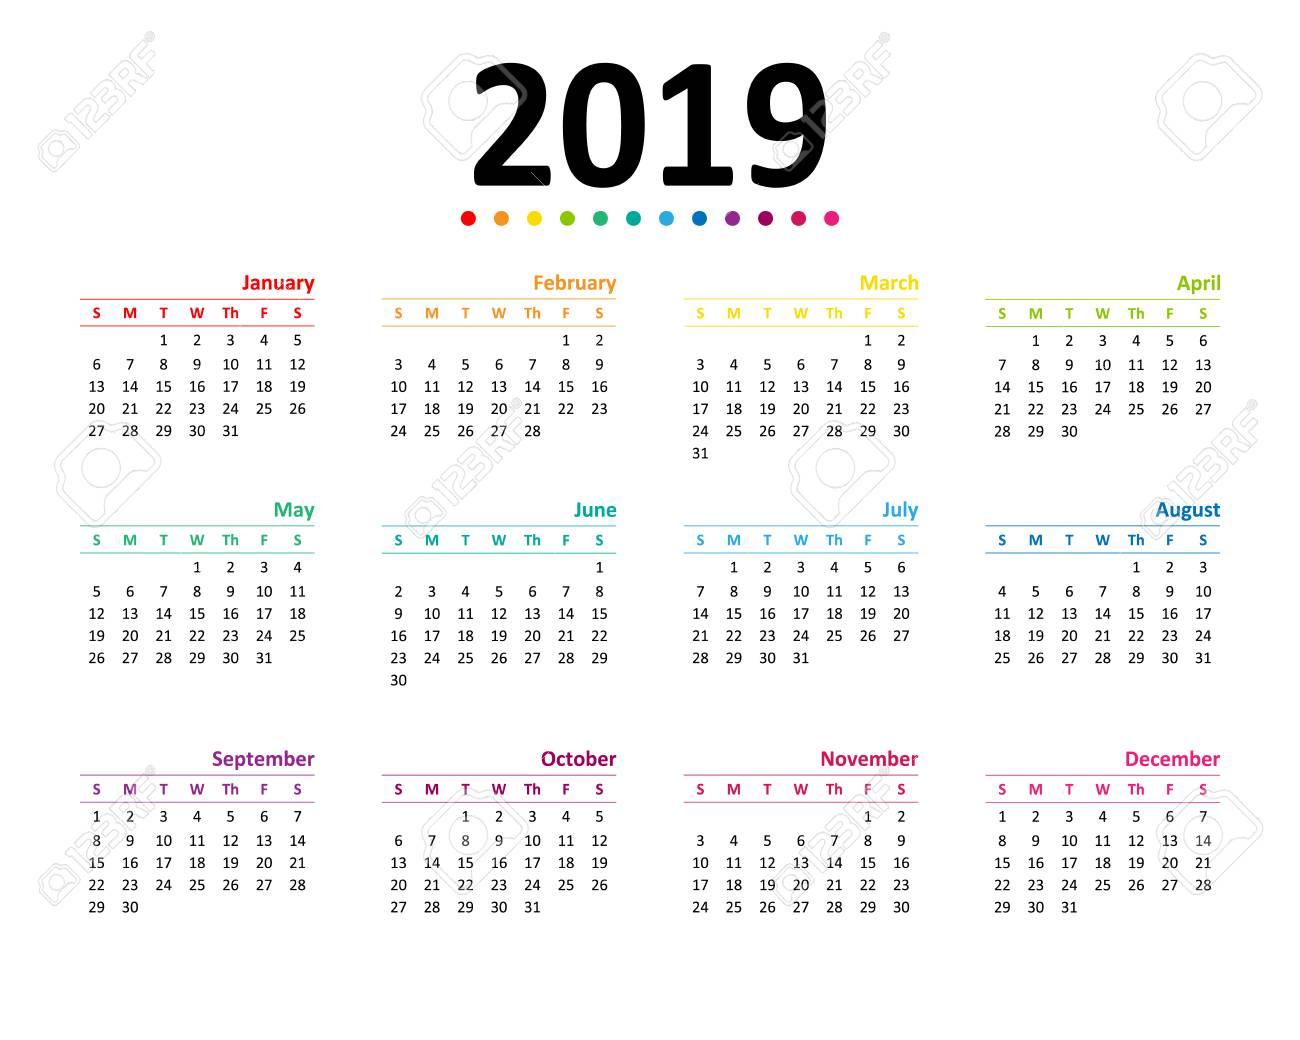 Year 2019 Calendar Wallpaper Vector Illustration Royalty 1300x1040